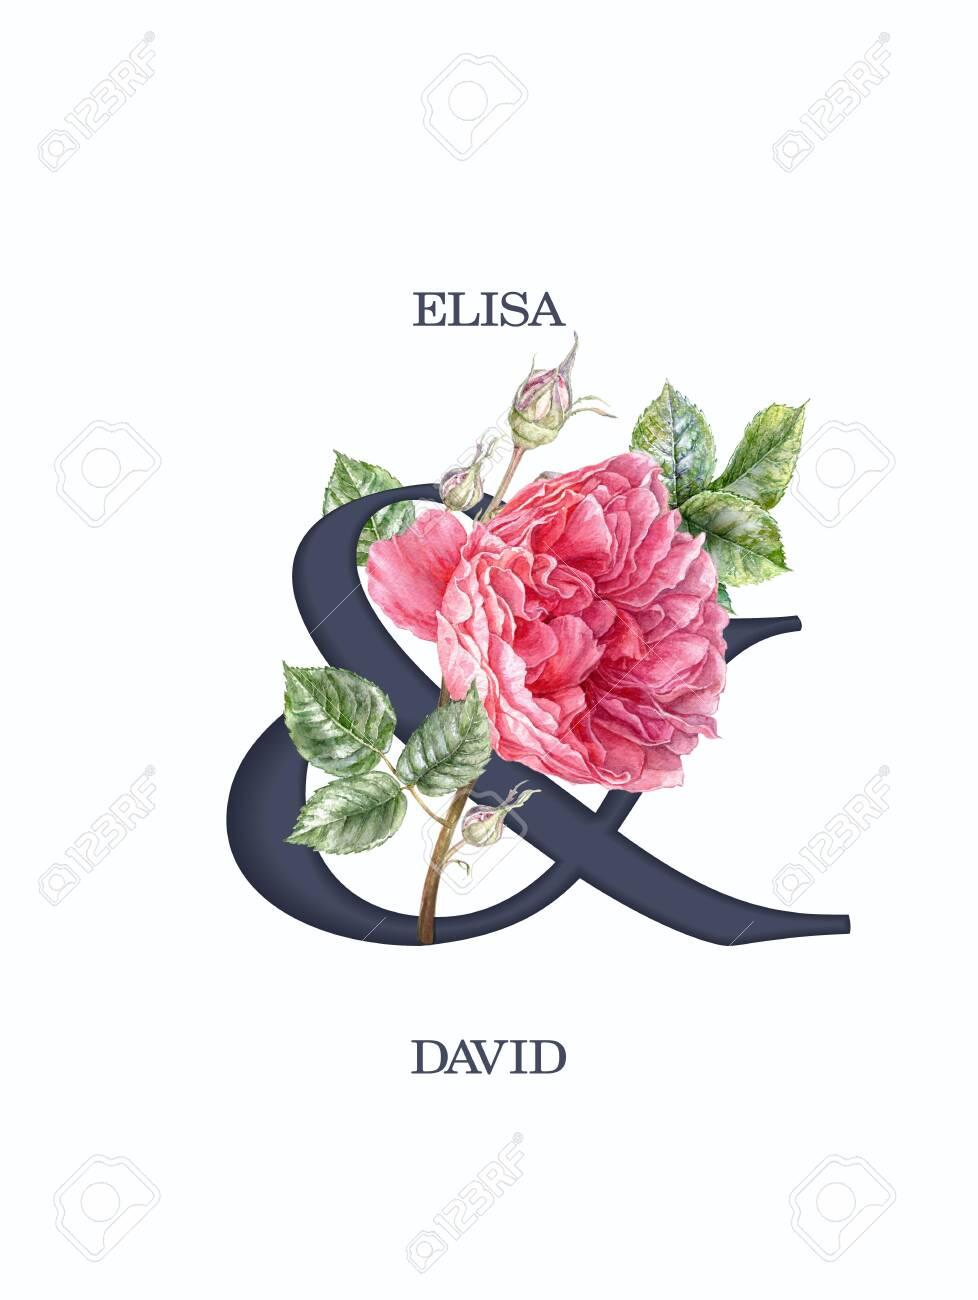 Watercolor pink rose flower wedding invitation card - 137489806